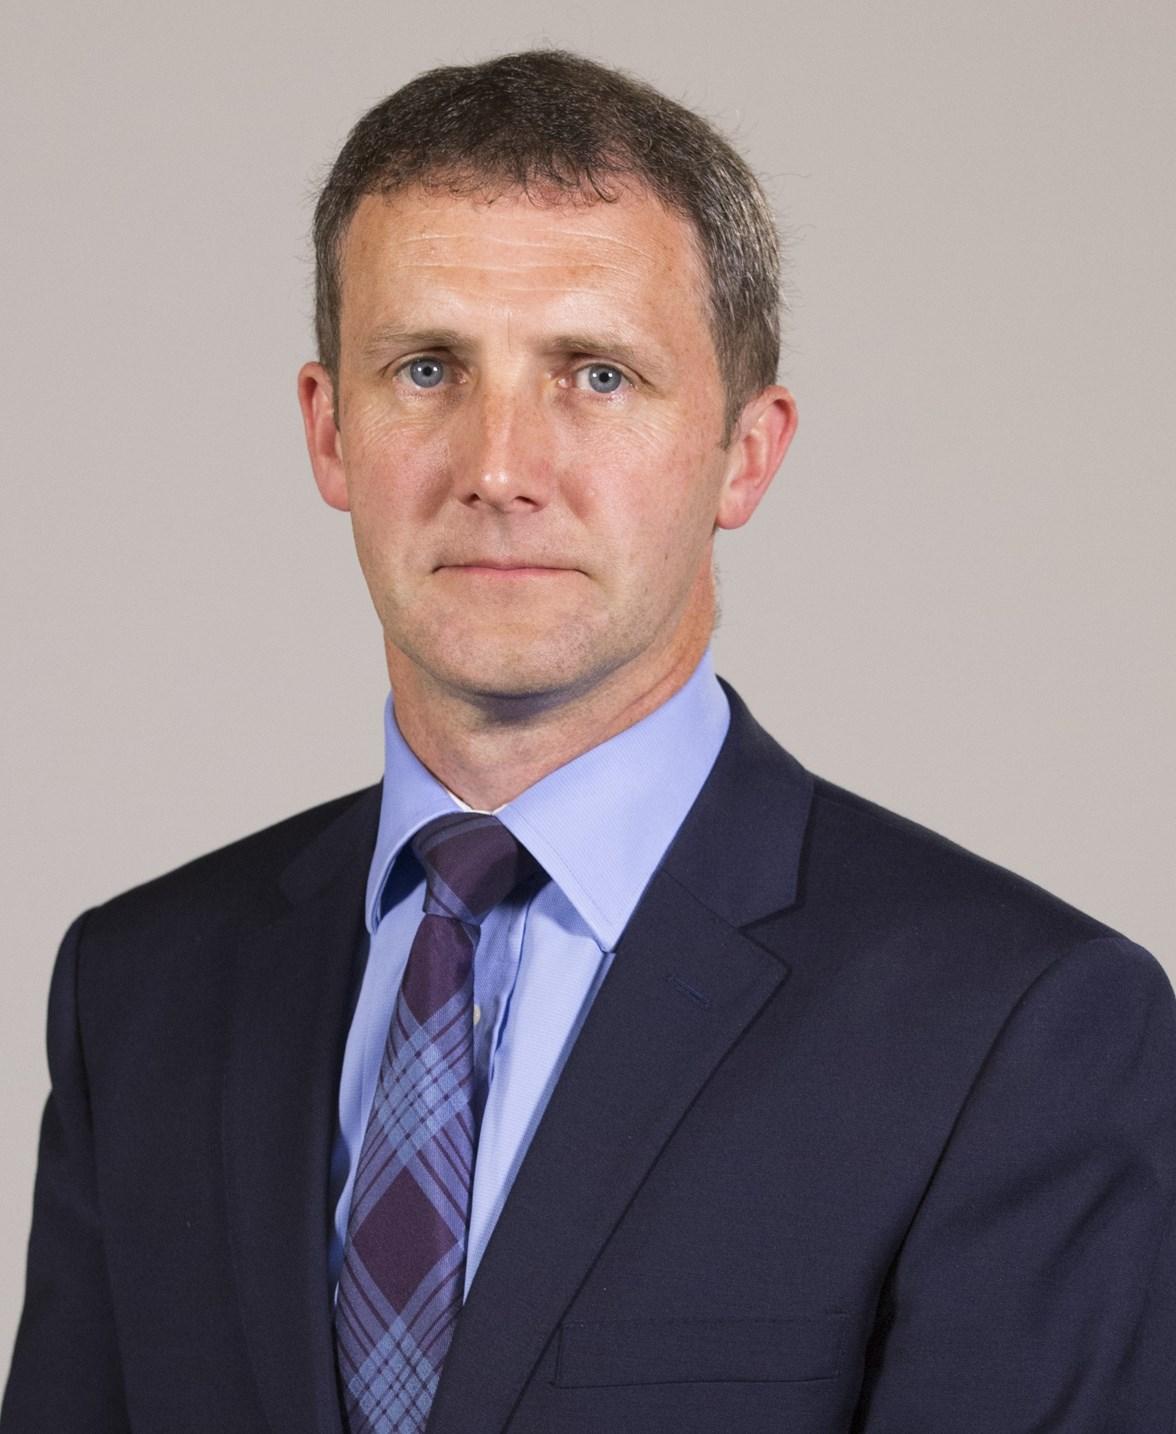 Michael Matheson